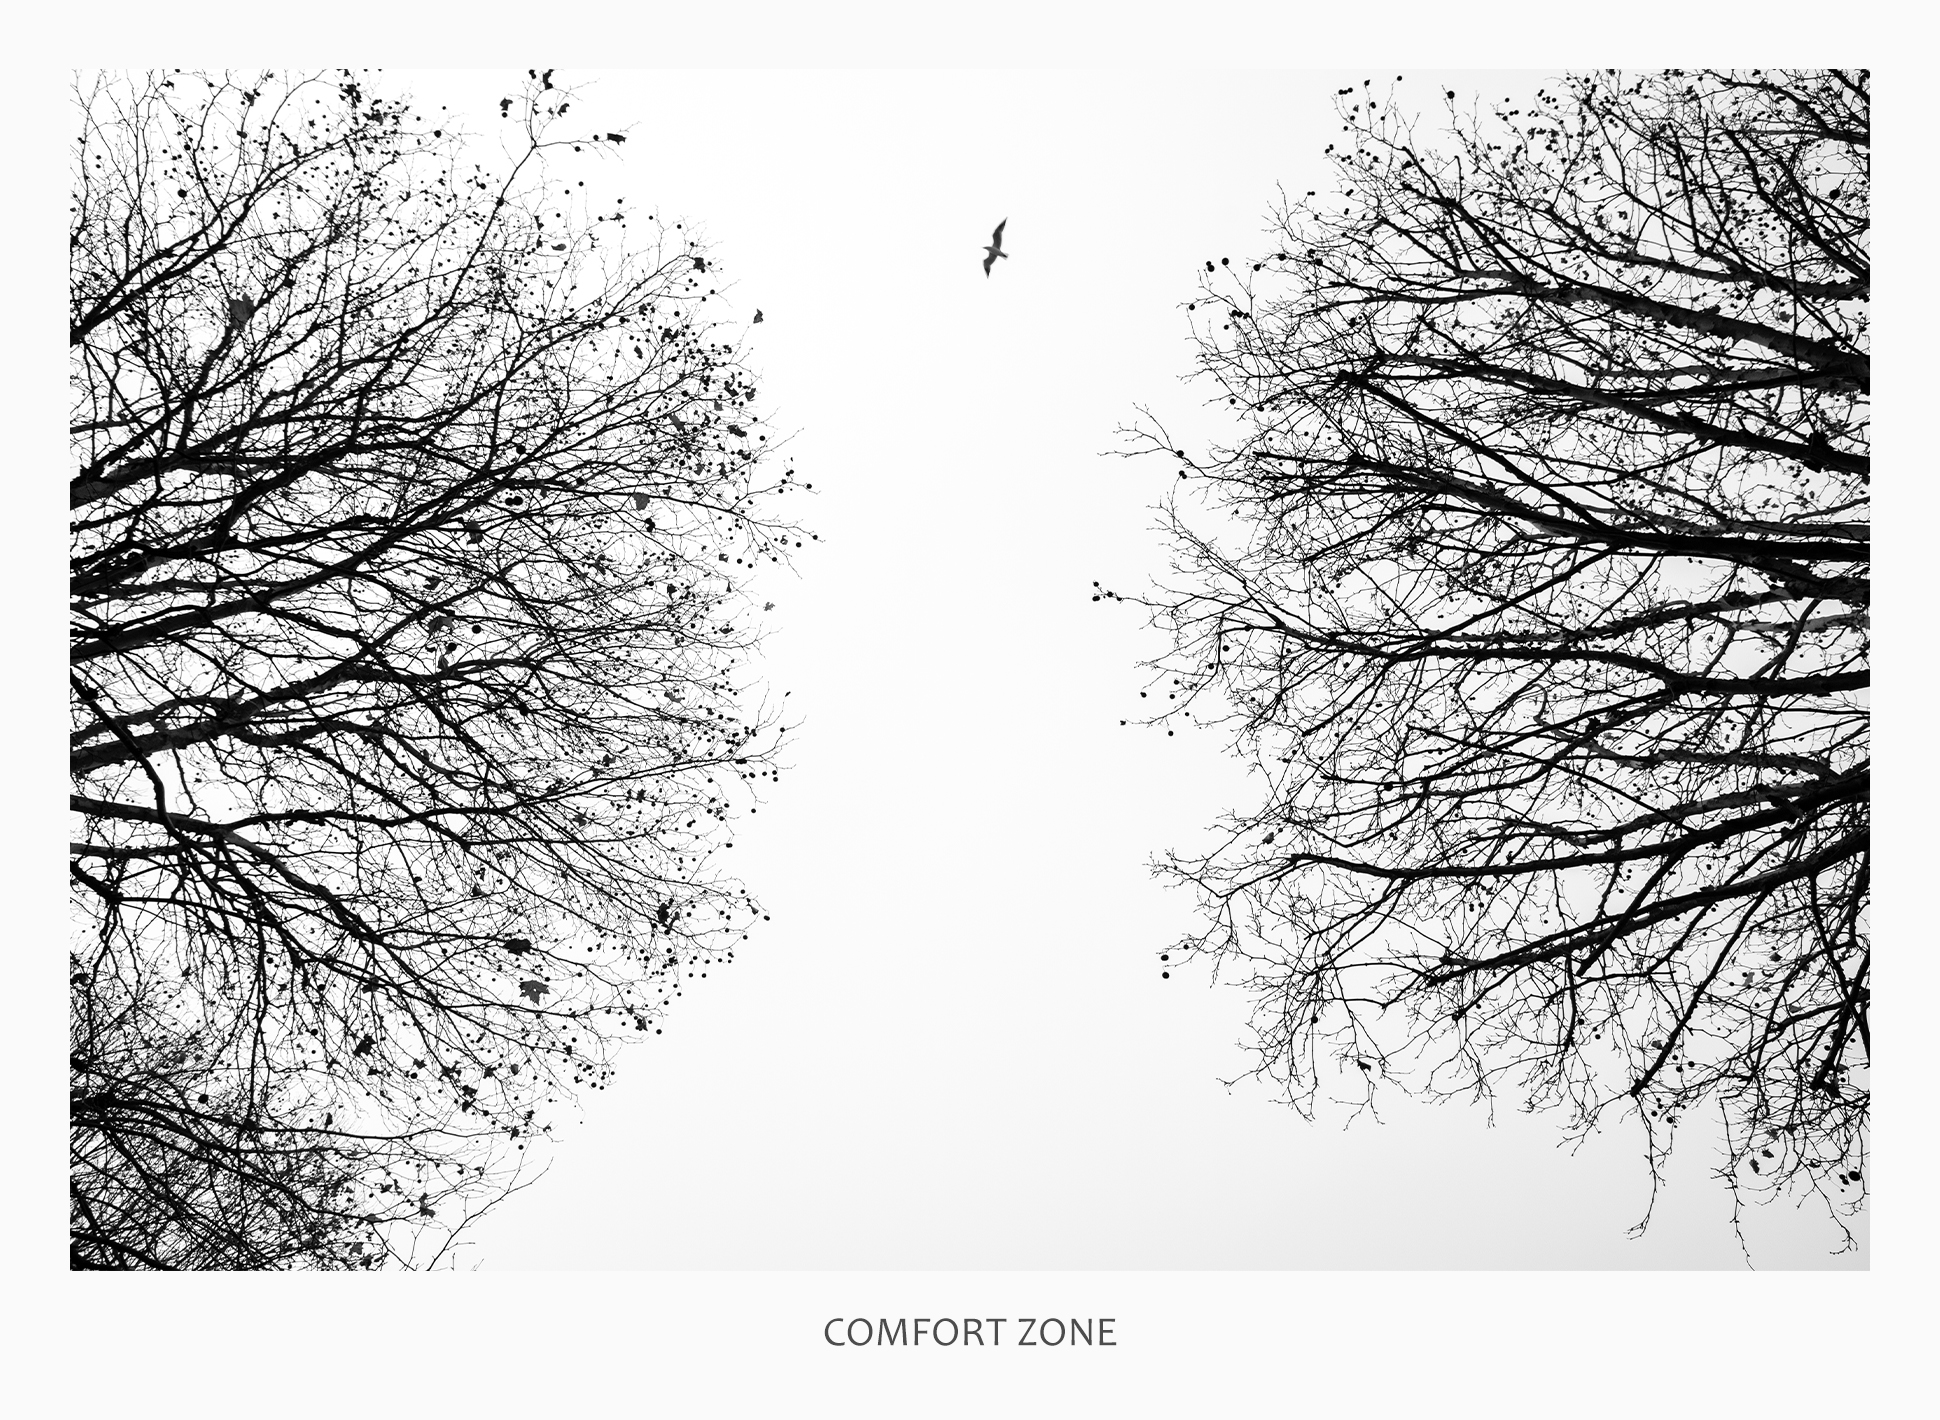 11 43691 - Comfort Zone